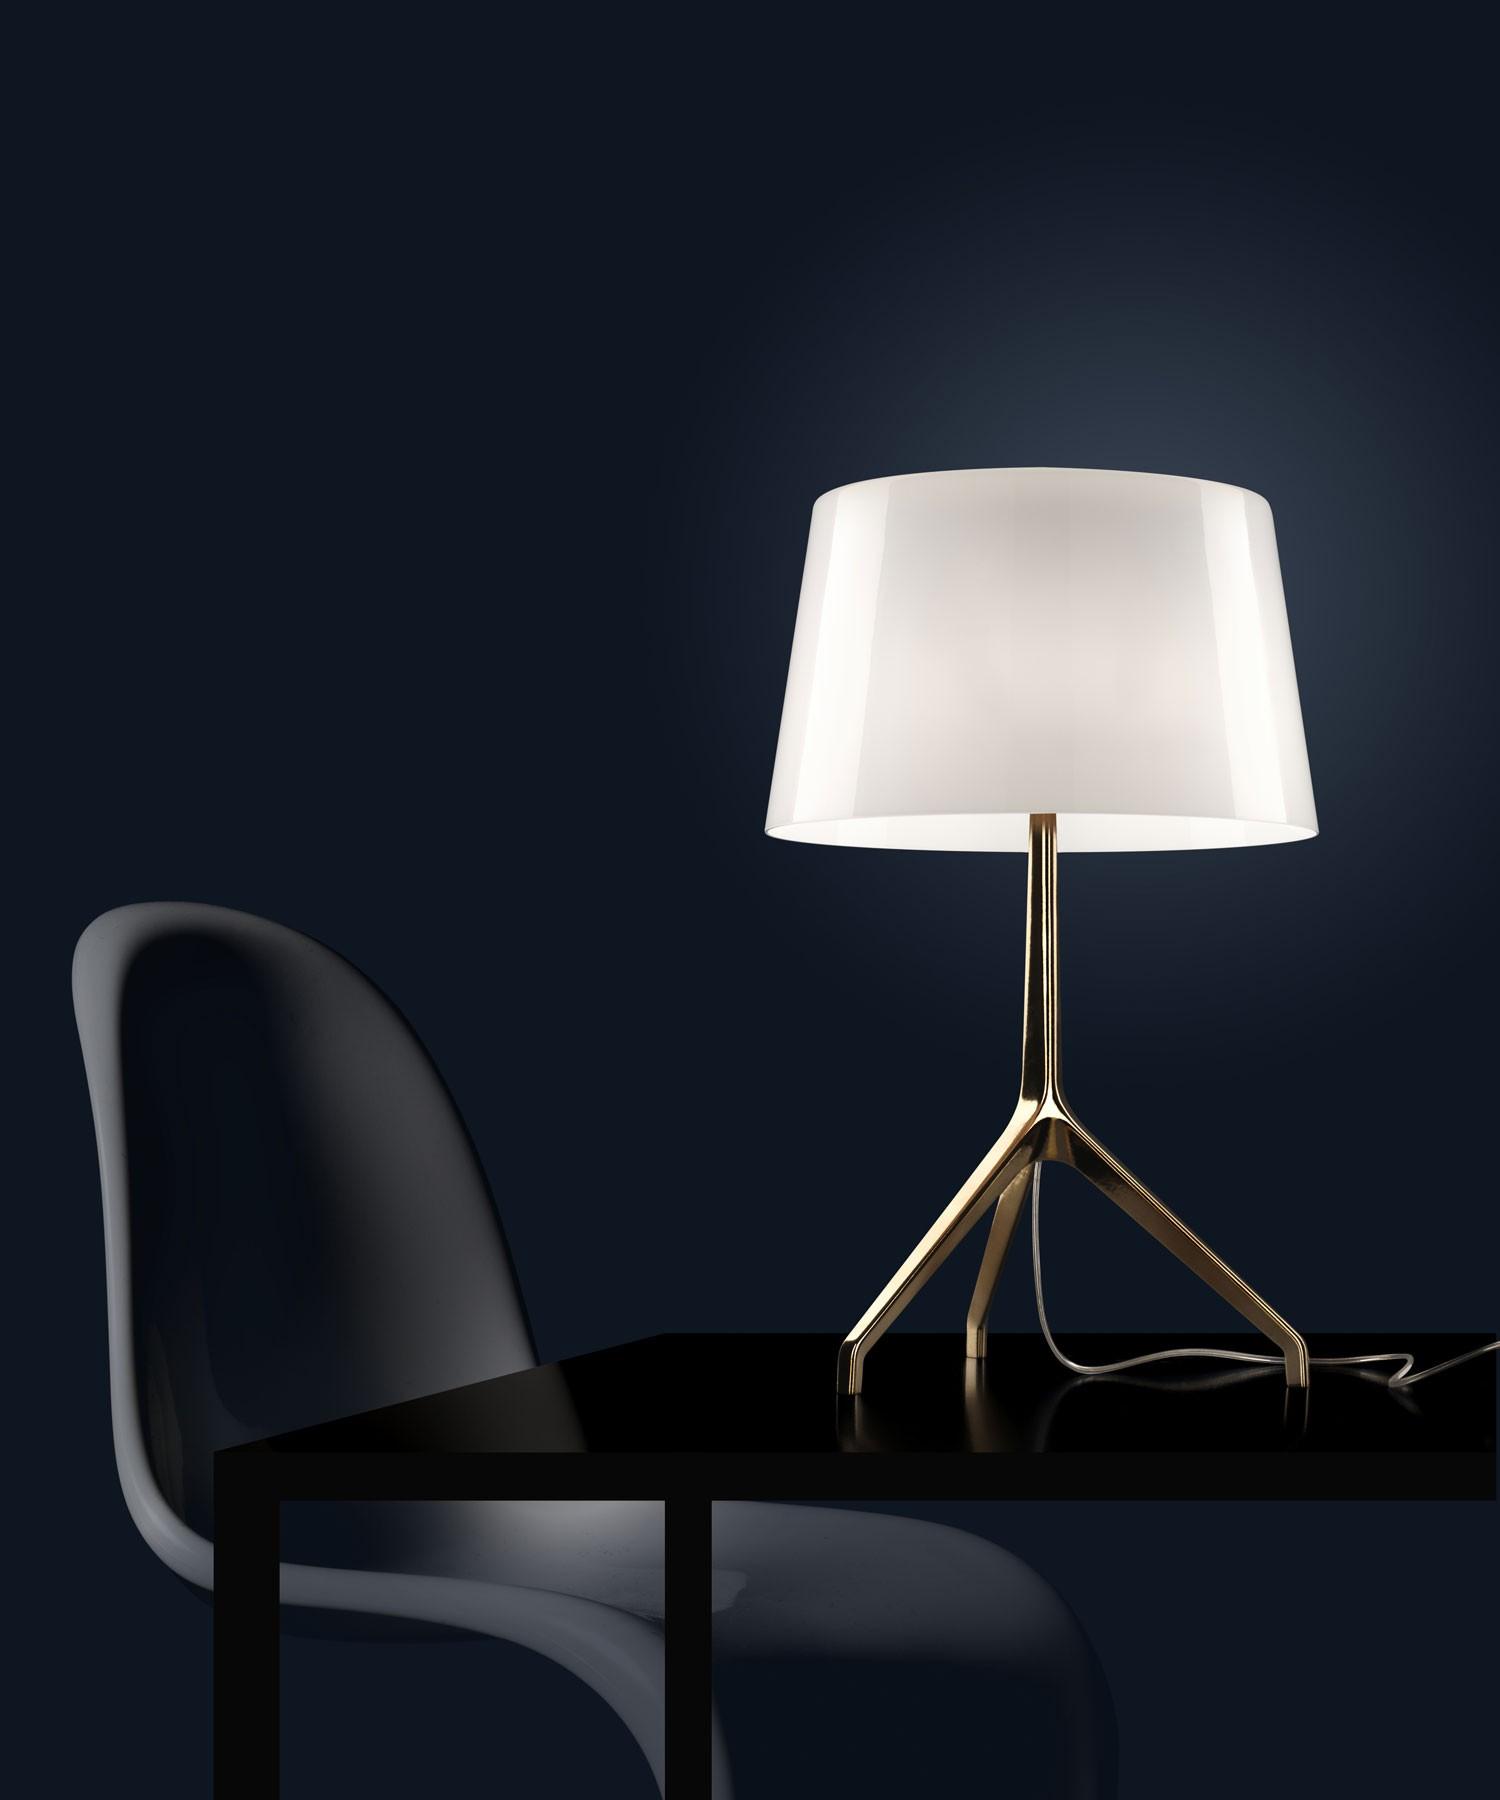 Foscarini lumiere xxl xxs table lamp - Foscarini lumiere table lamp ...